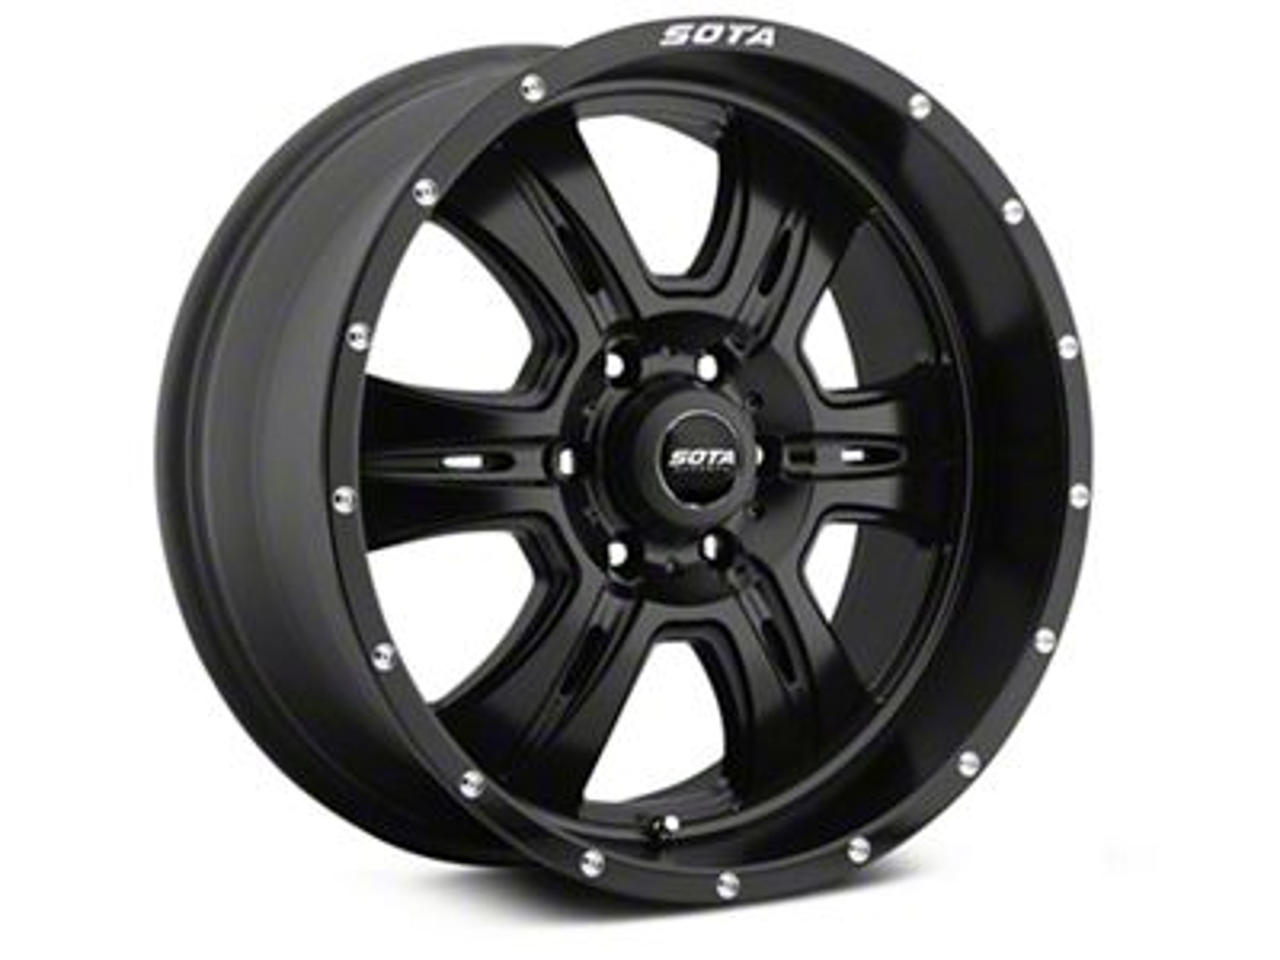 SOTA Off Road REHAB Stealth Black 6-Lug Wheel - 20x9 (99-18 Silverado 1500)